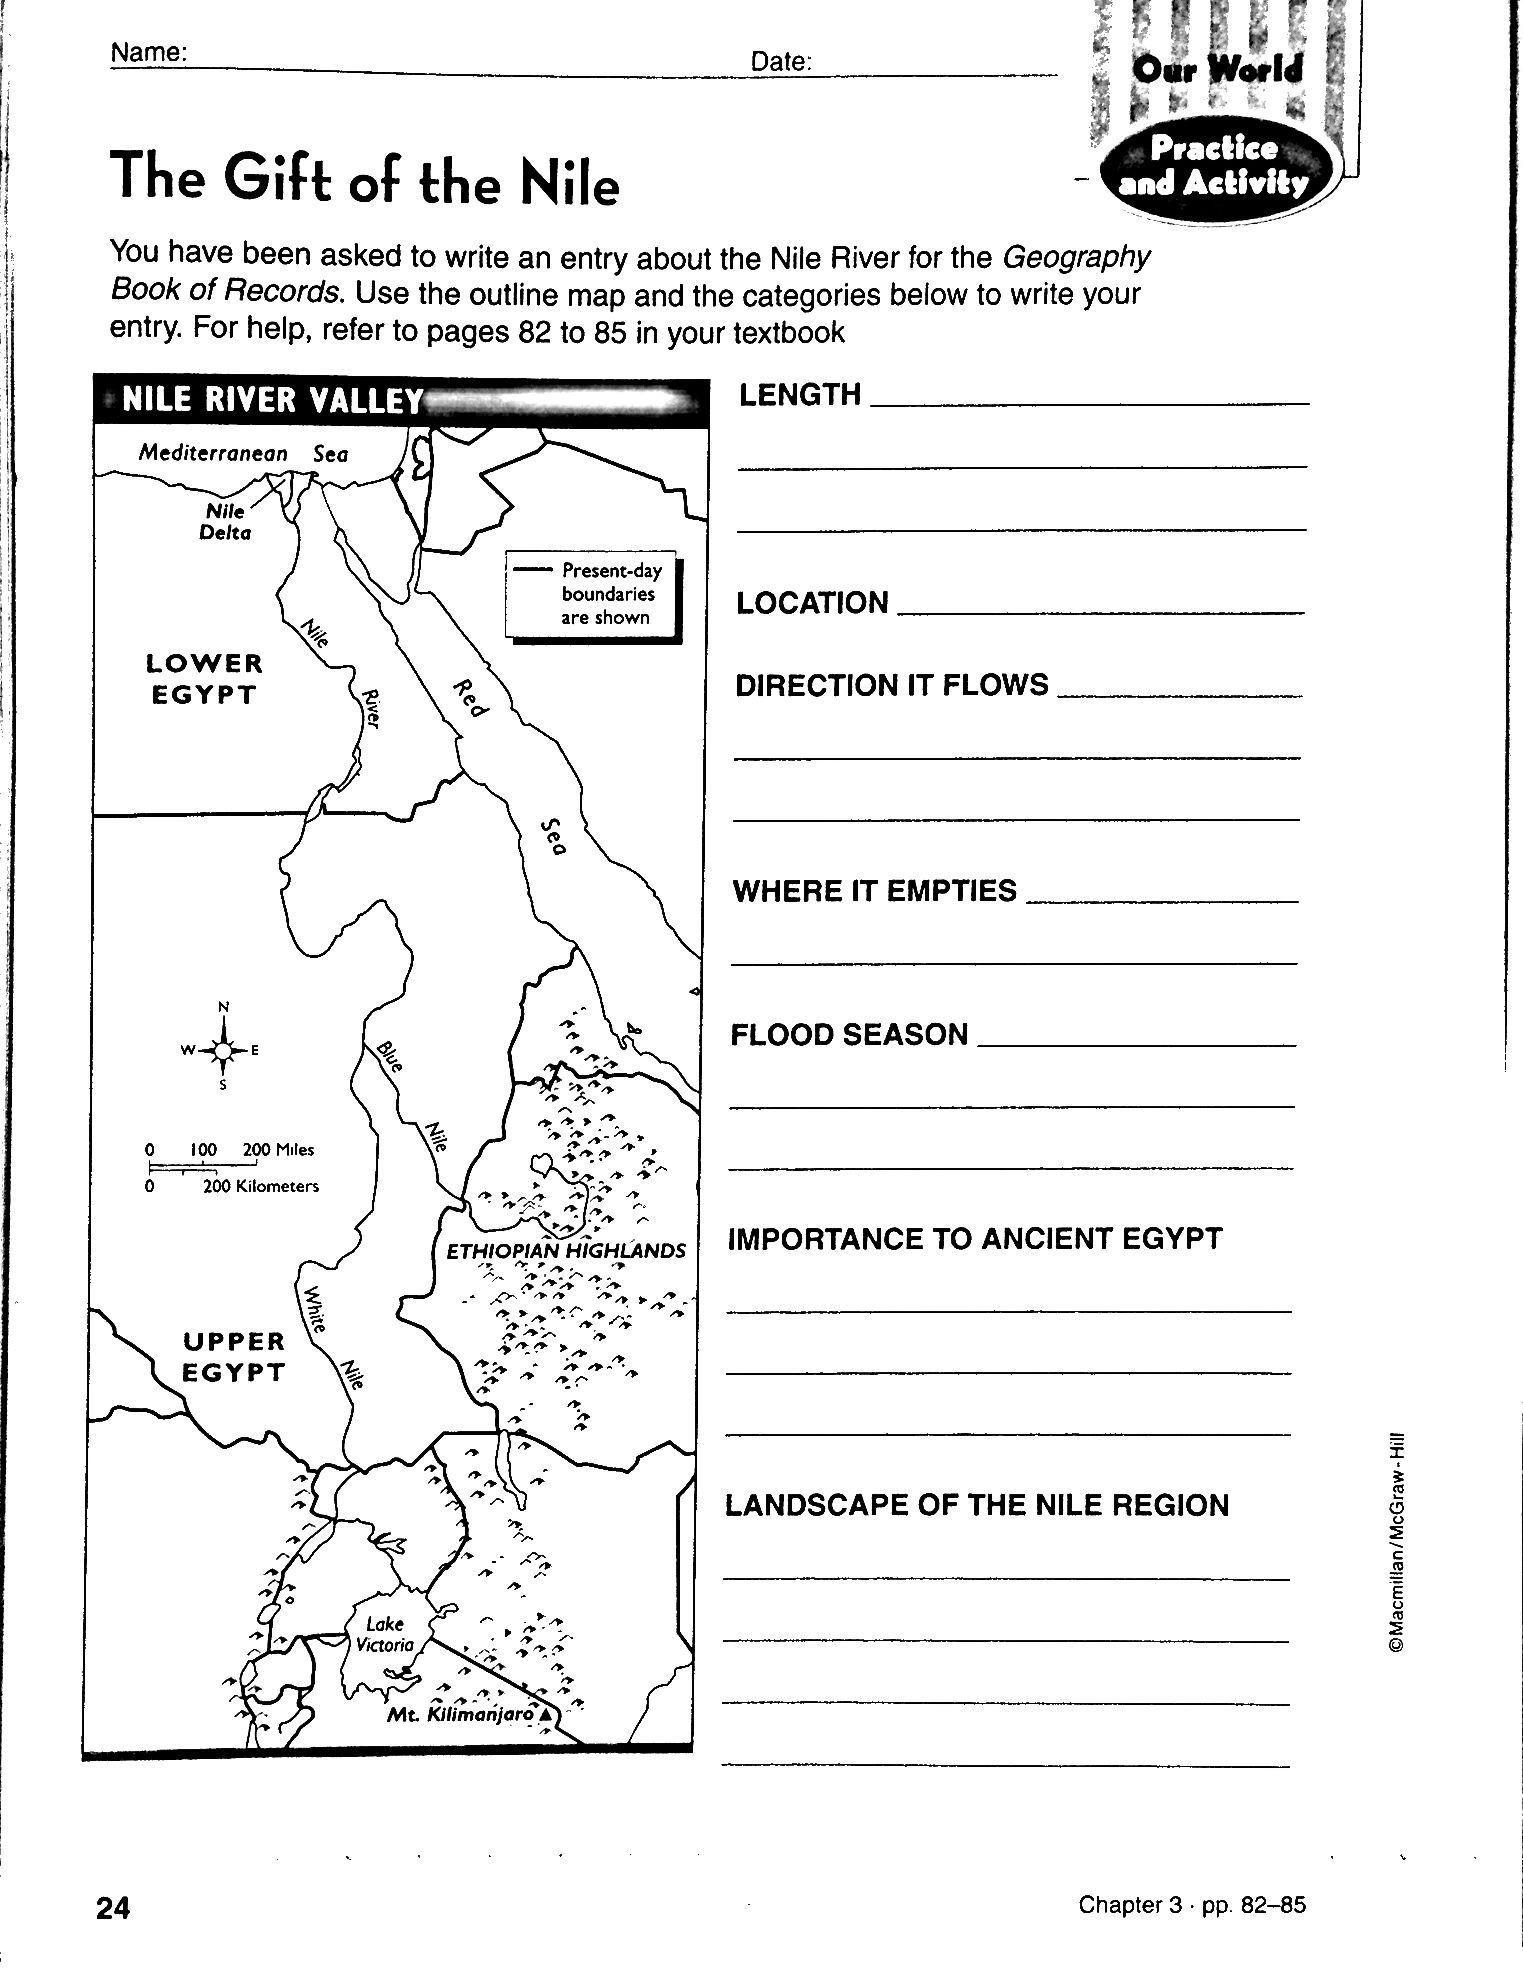 3rd Grade social Studies Worksheet 3rd Grade social Stu S Worksheets with Answer Pdf 10th